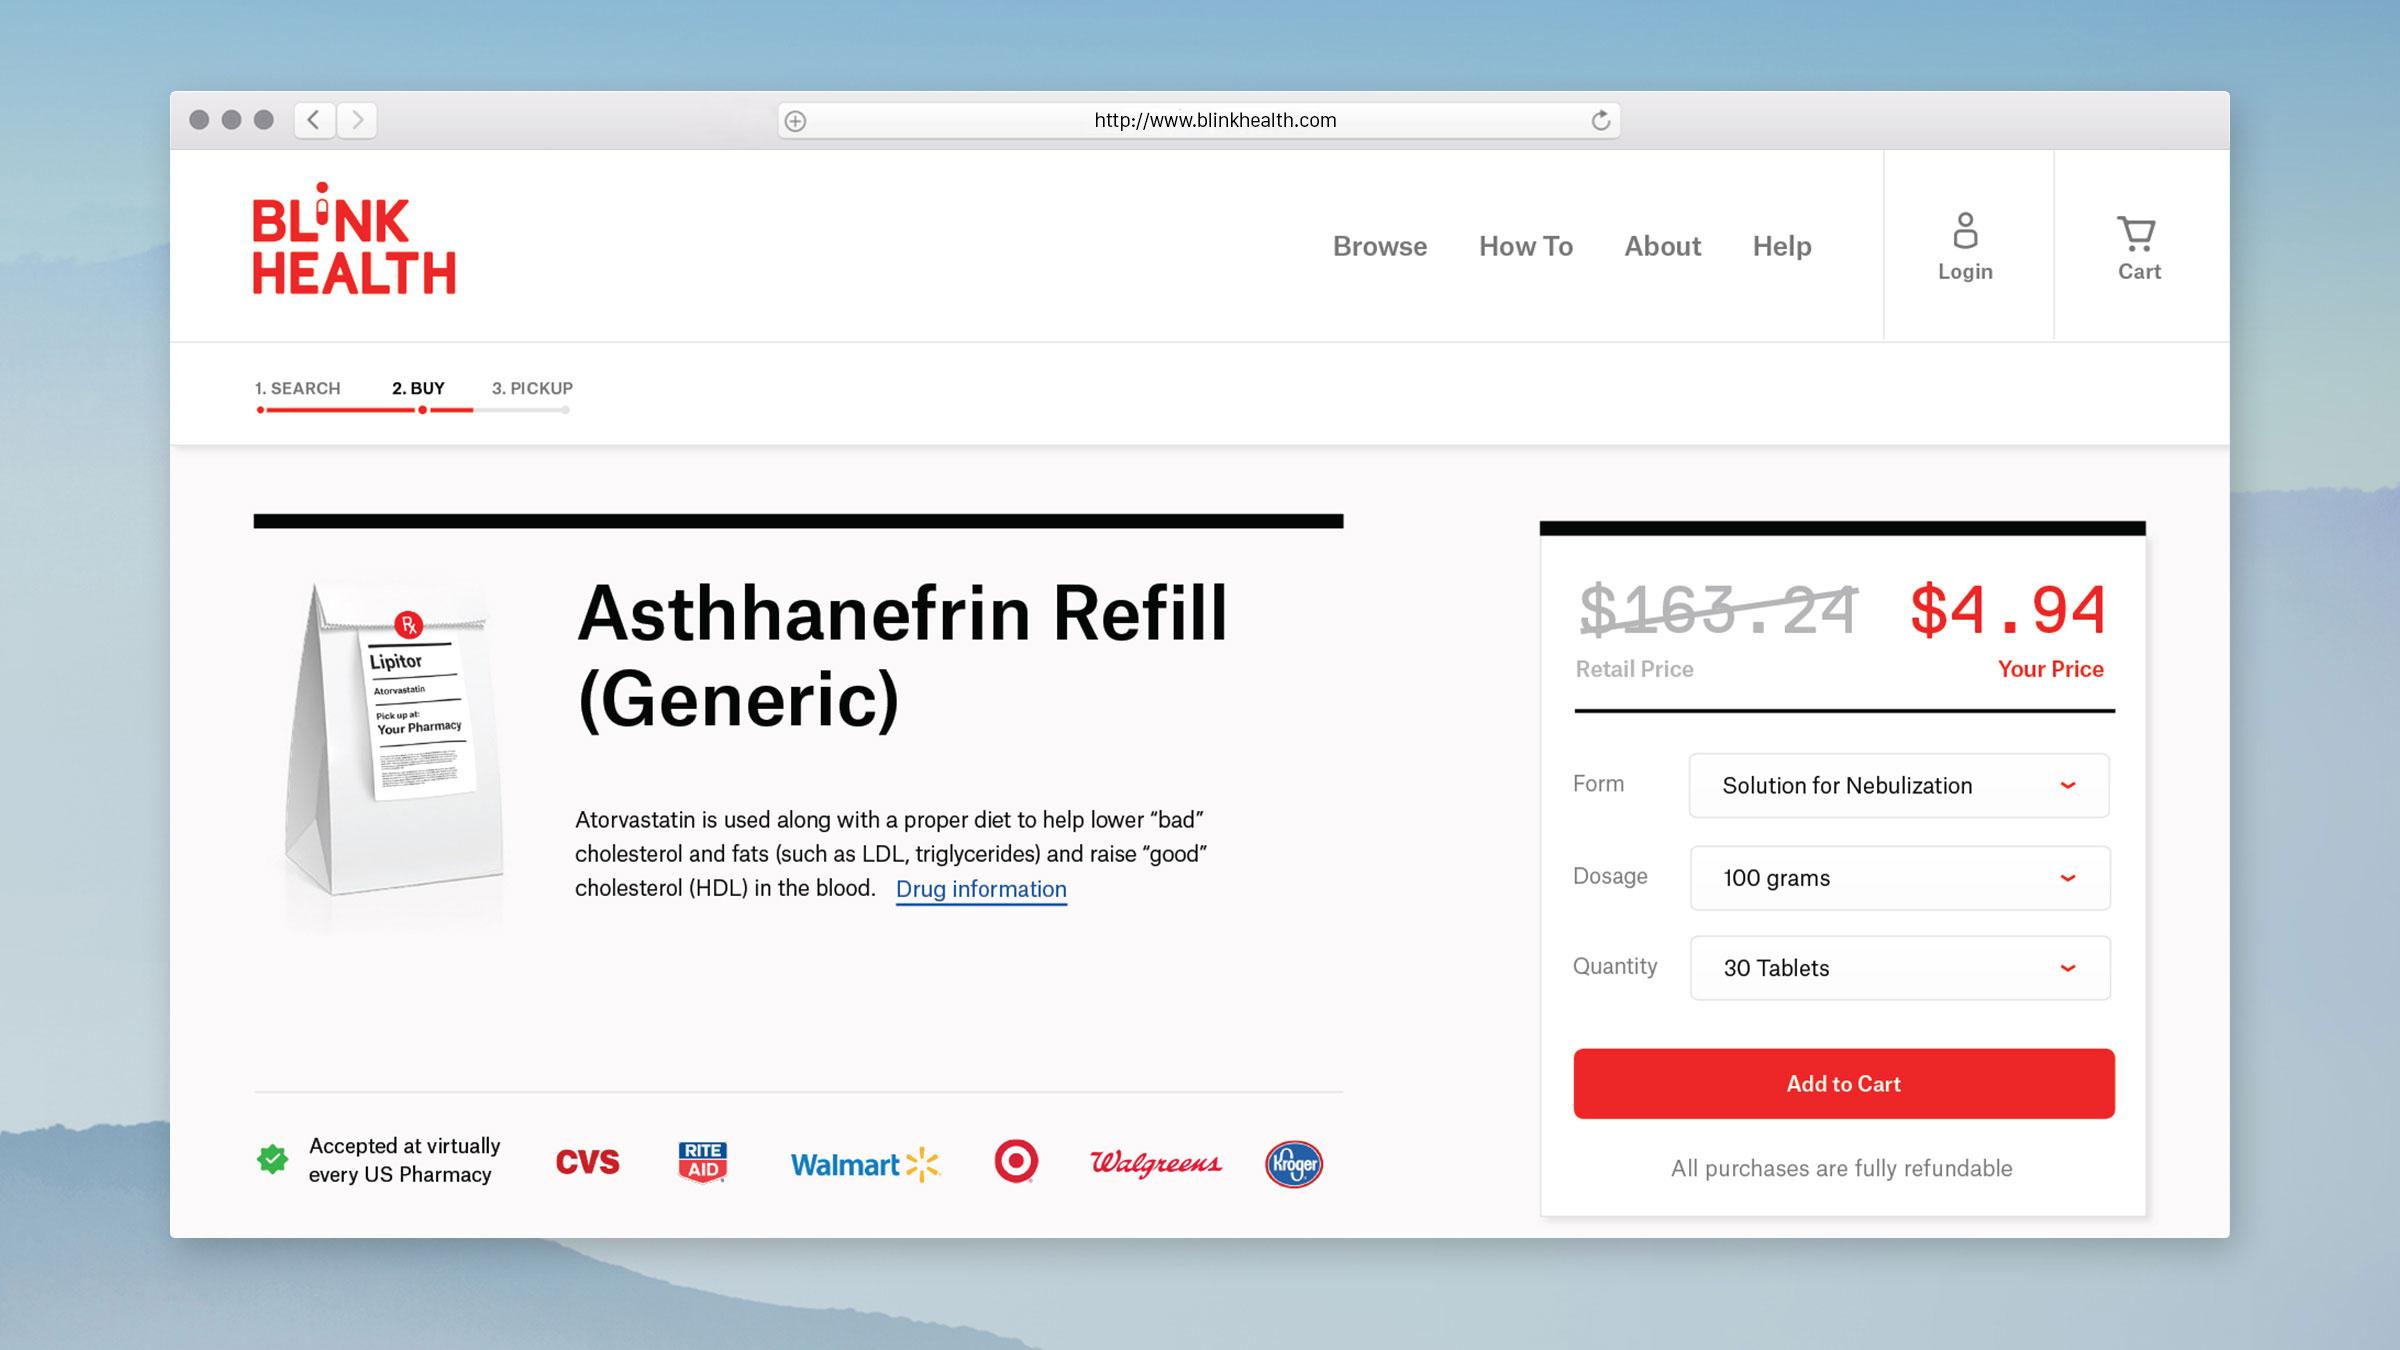 Web Design for Blink Health - PDP